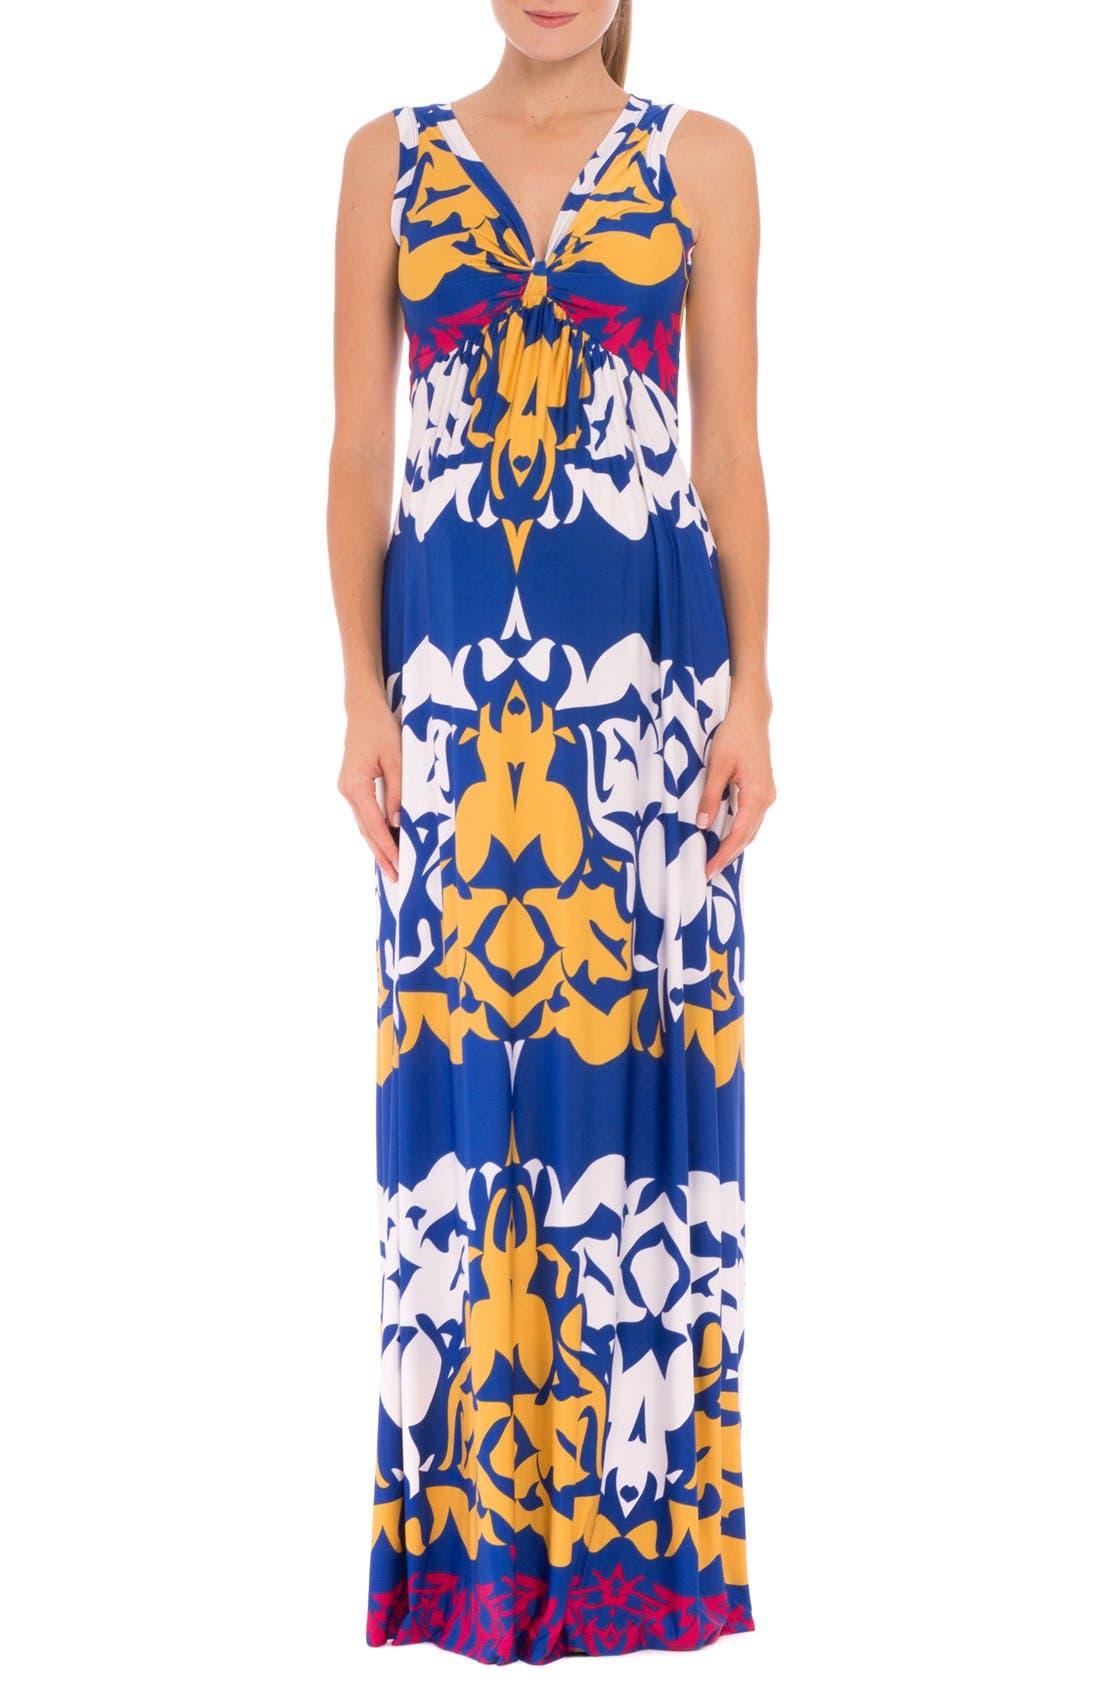 Main Image - Olian 'Ellie' Print Maternity Maxi Dress